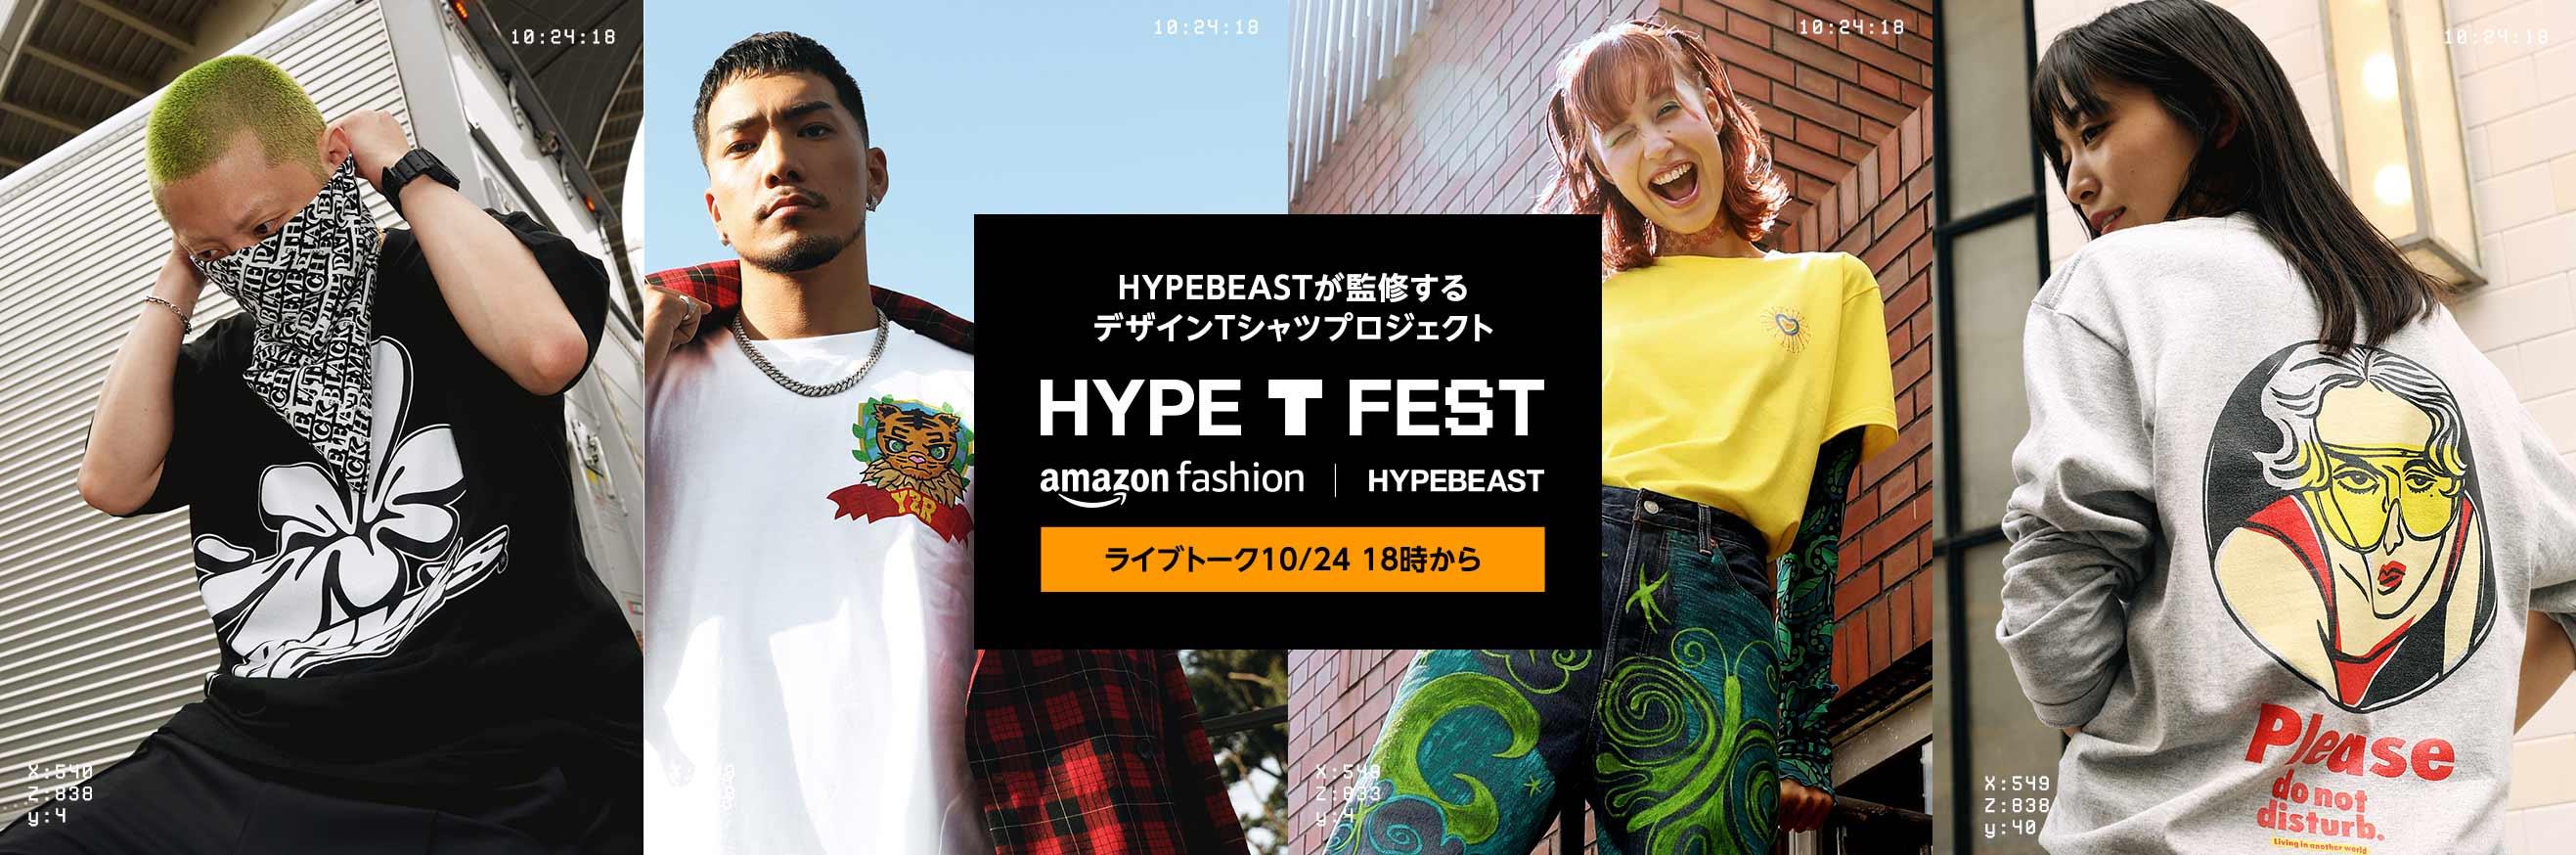 HYPE T FEST ライブトーク10/24 18時から - HYPEBEASTが監修するデザインTシャツプロジェクト